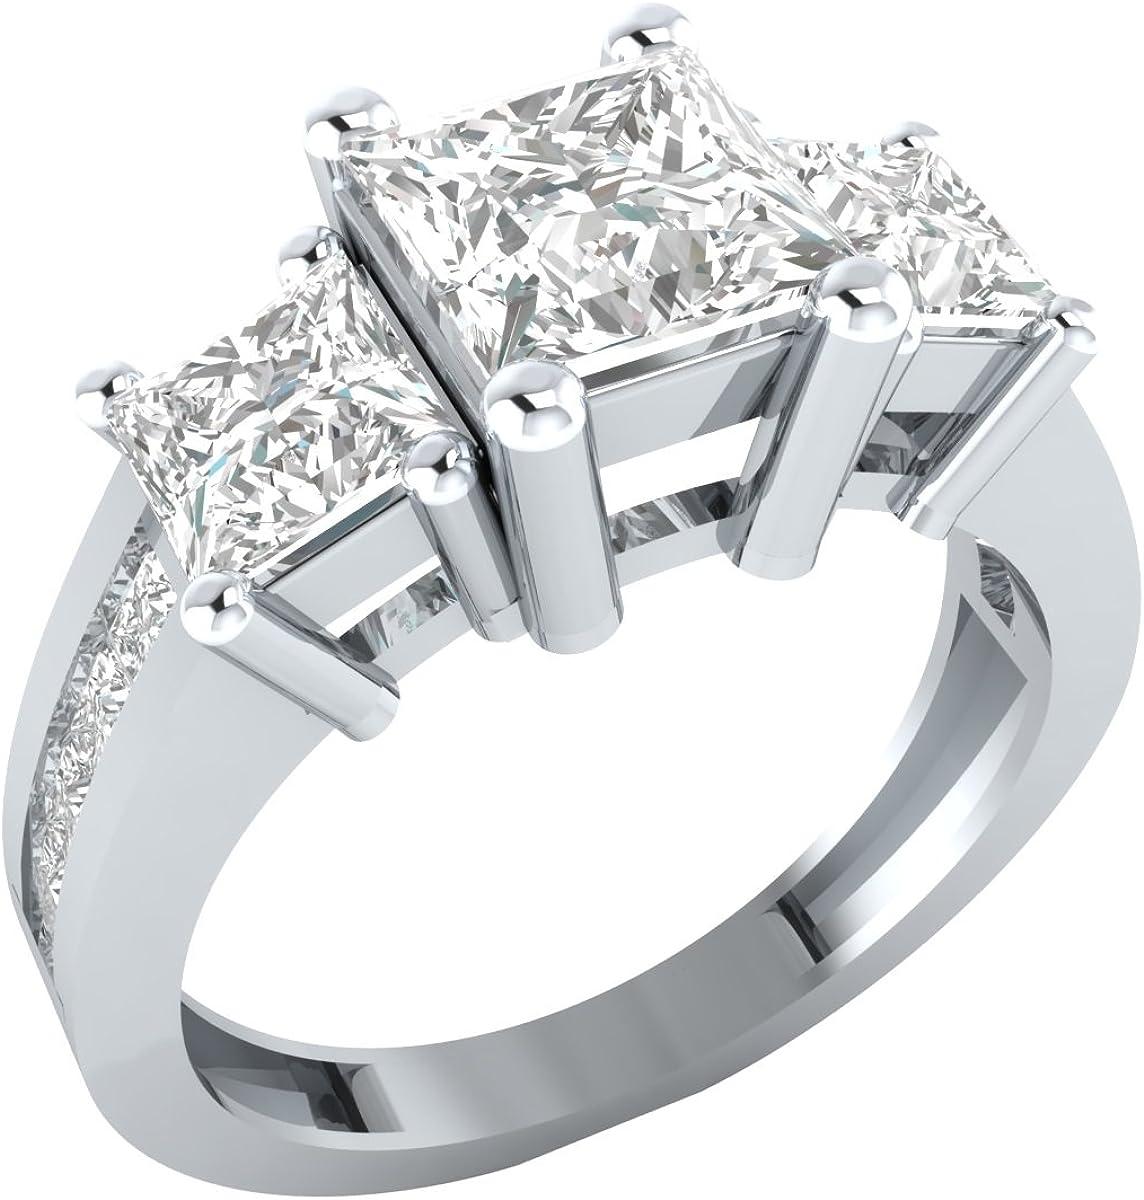 Demira Jewels 14k Solid White Gold Princess Cut Cz Cubic Zirconia Three Stone Engagement Ring Amazon Com